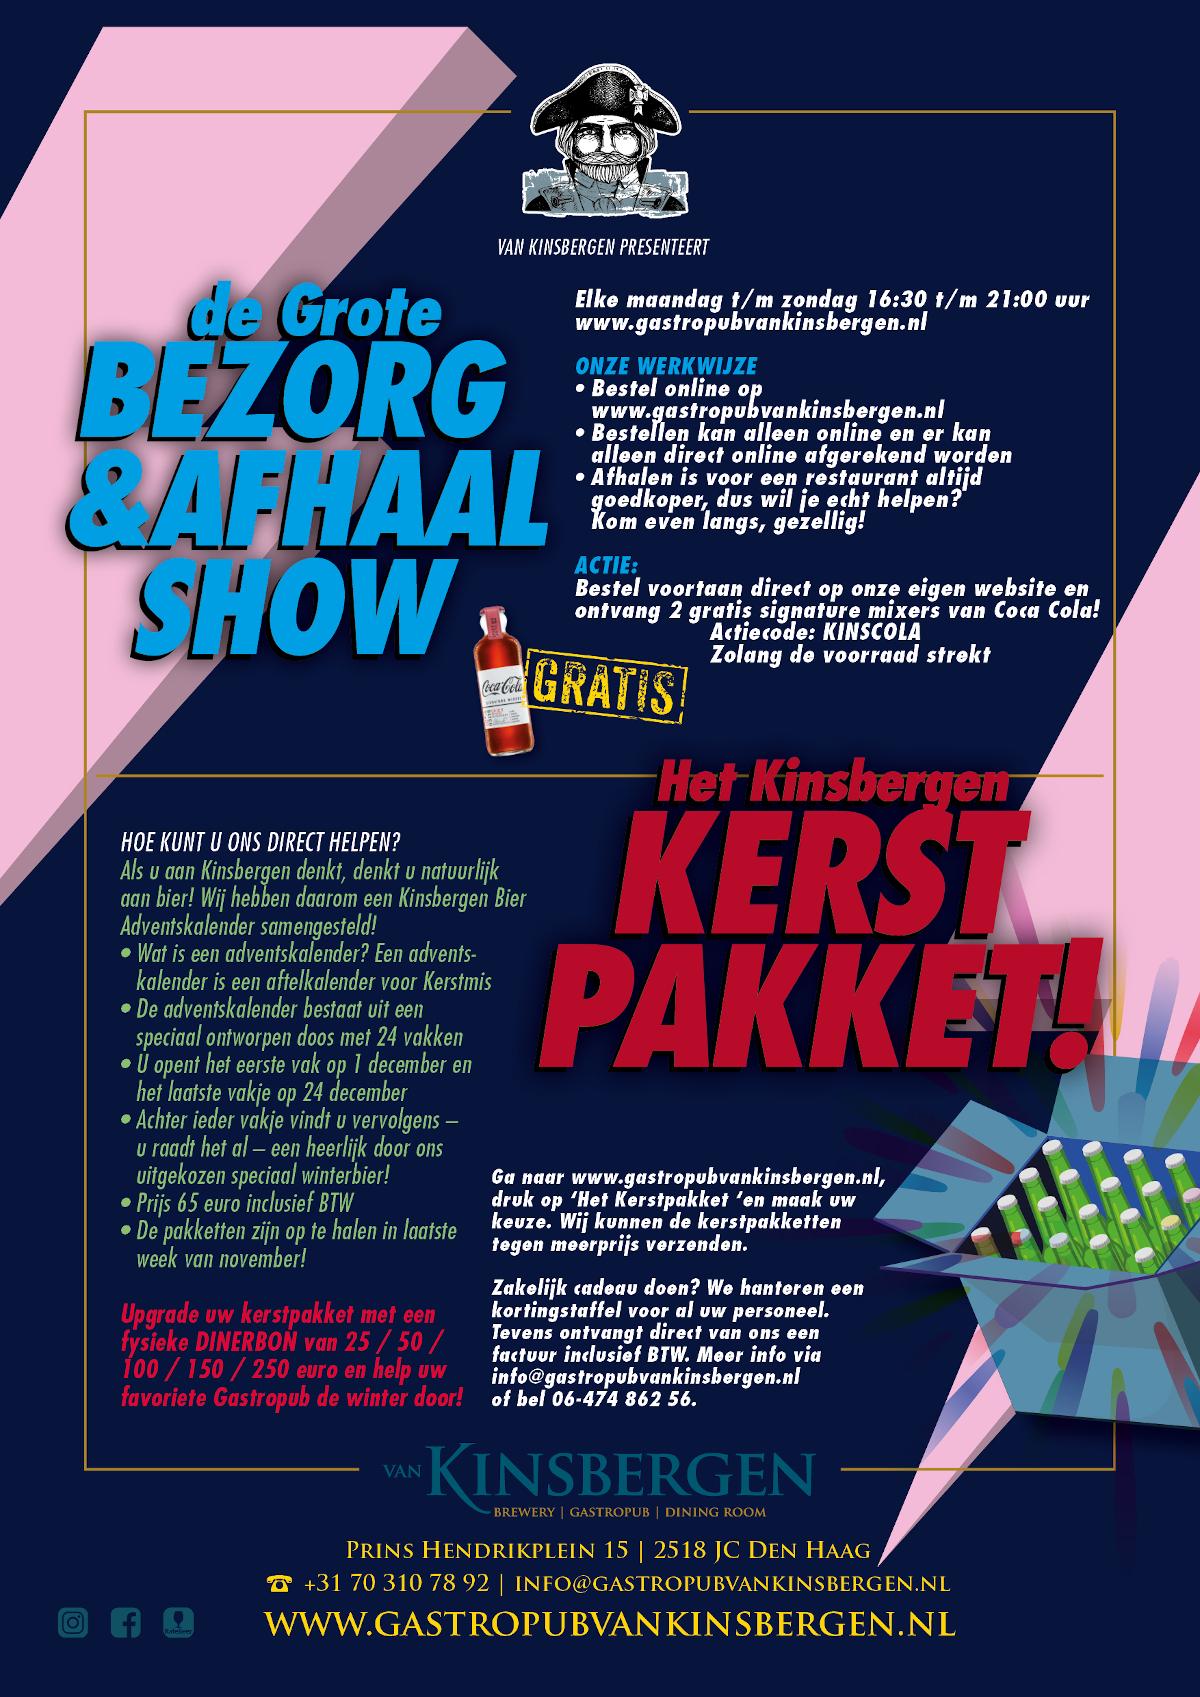 bezorg-en-afhaal-show